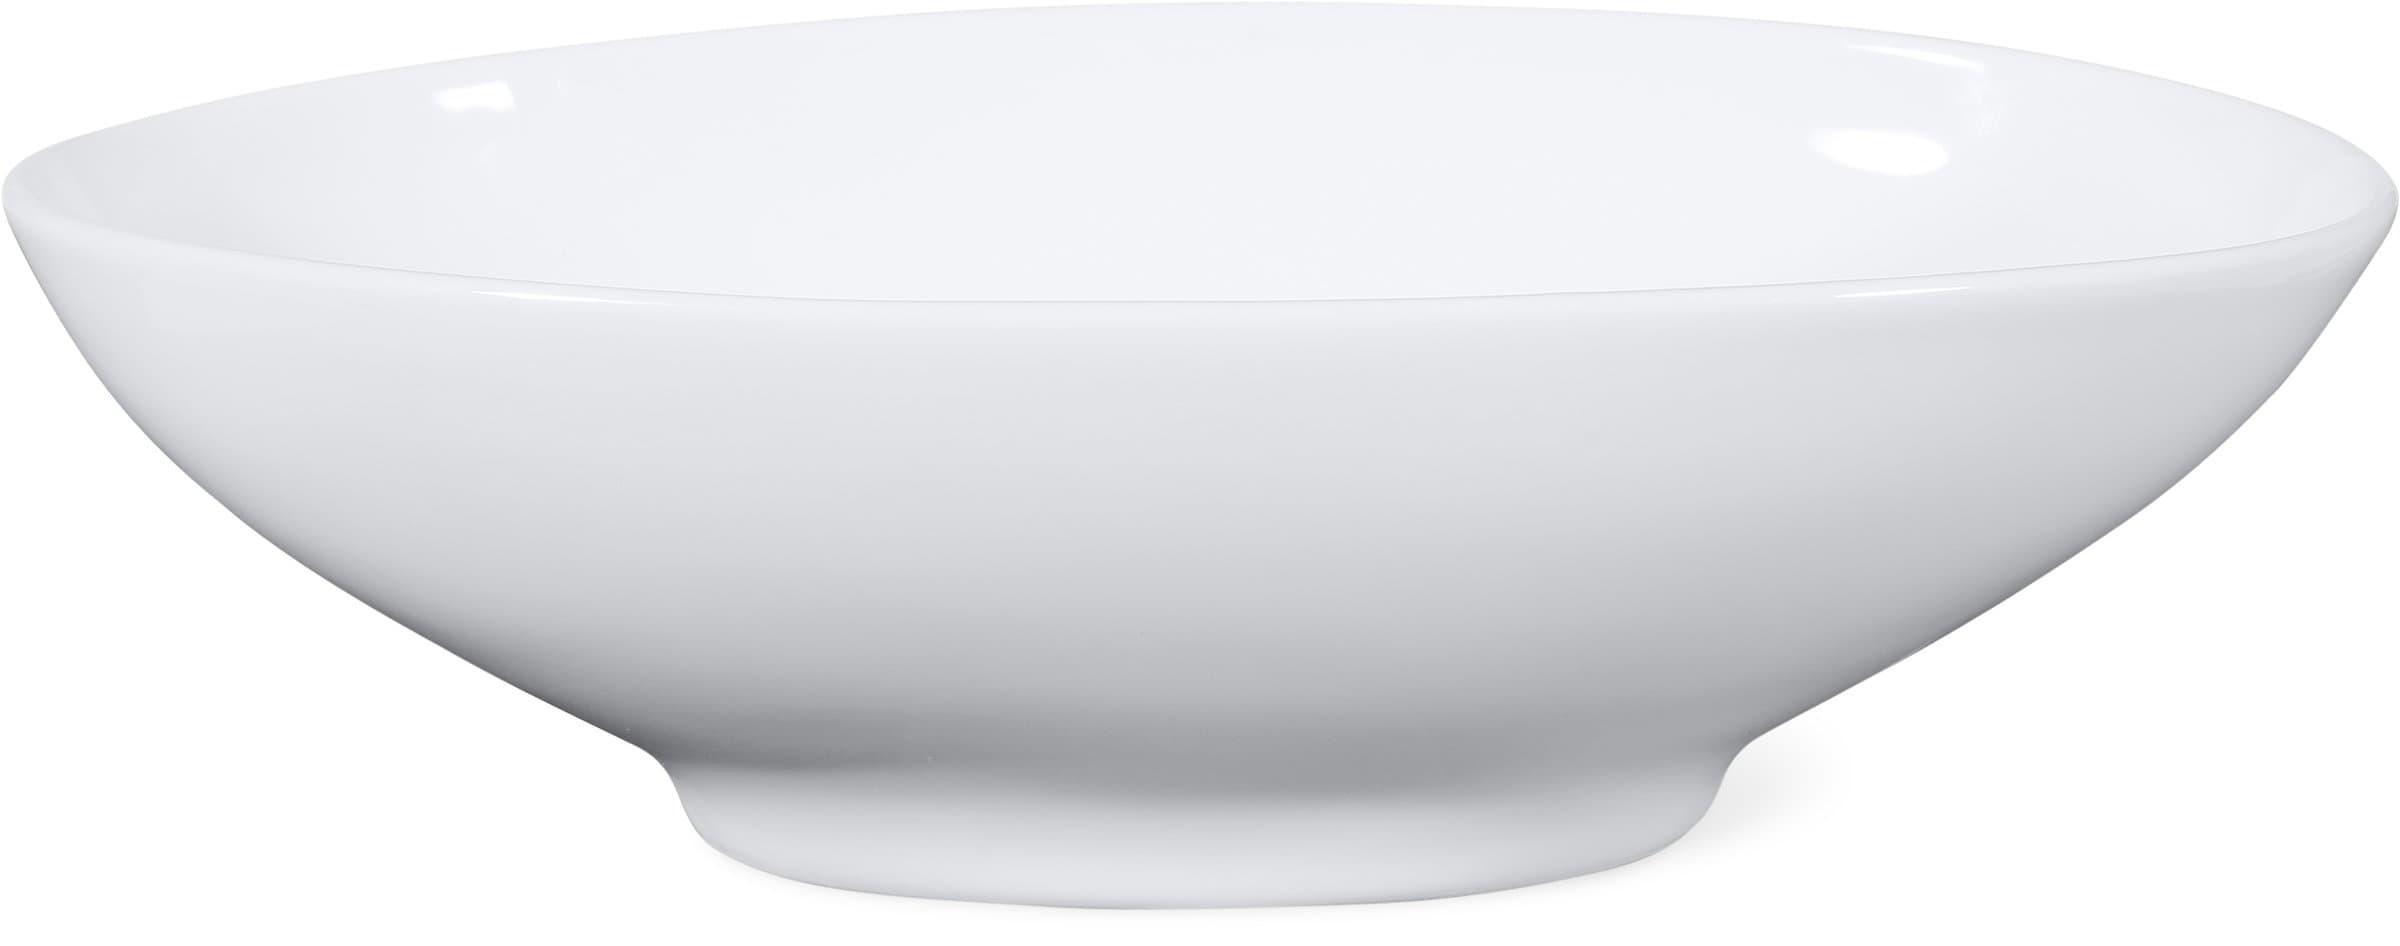 Cucina & Tavola PURE Bol 19x11.5cm